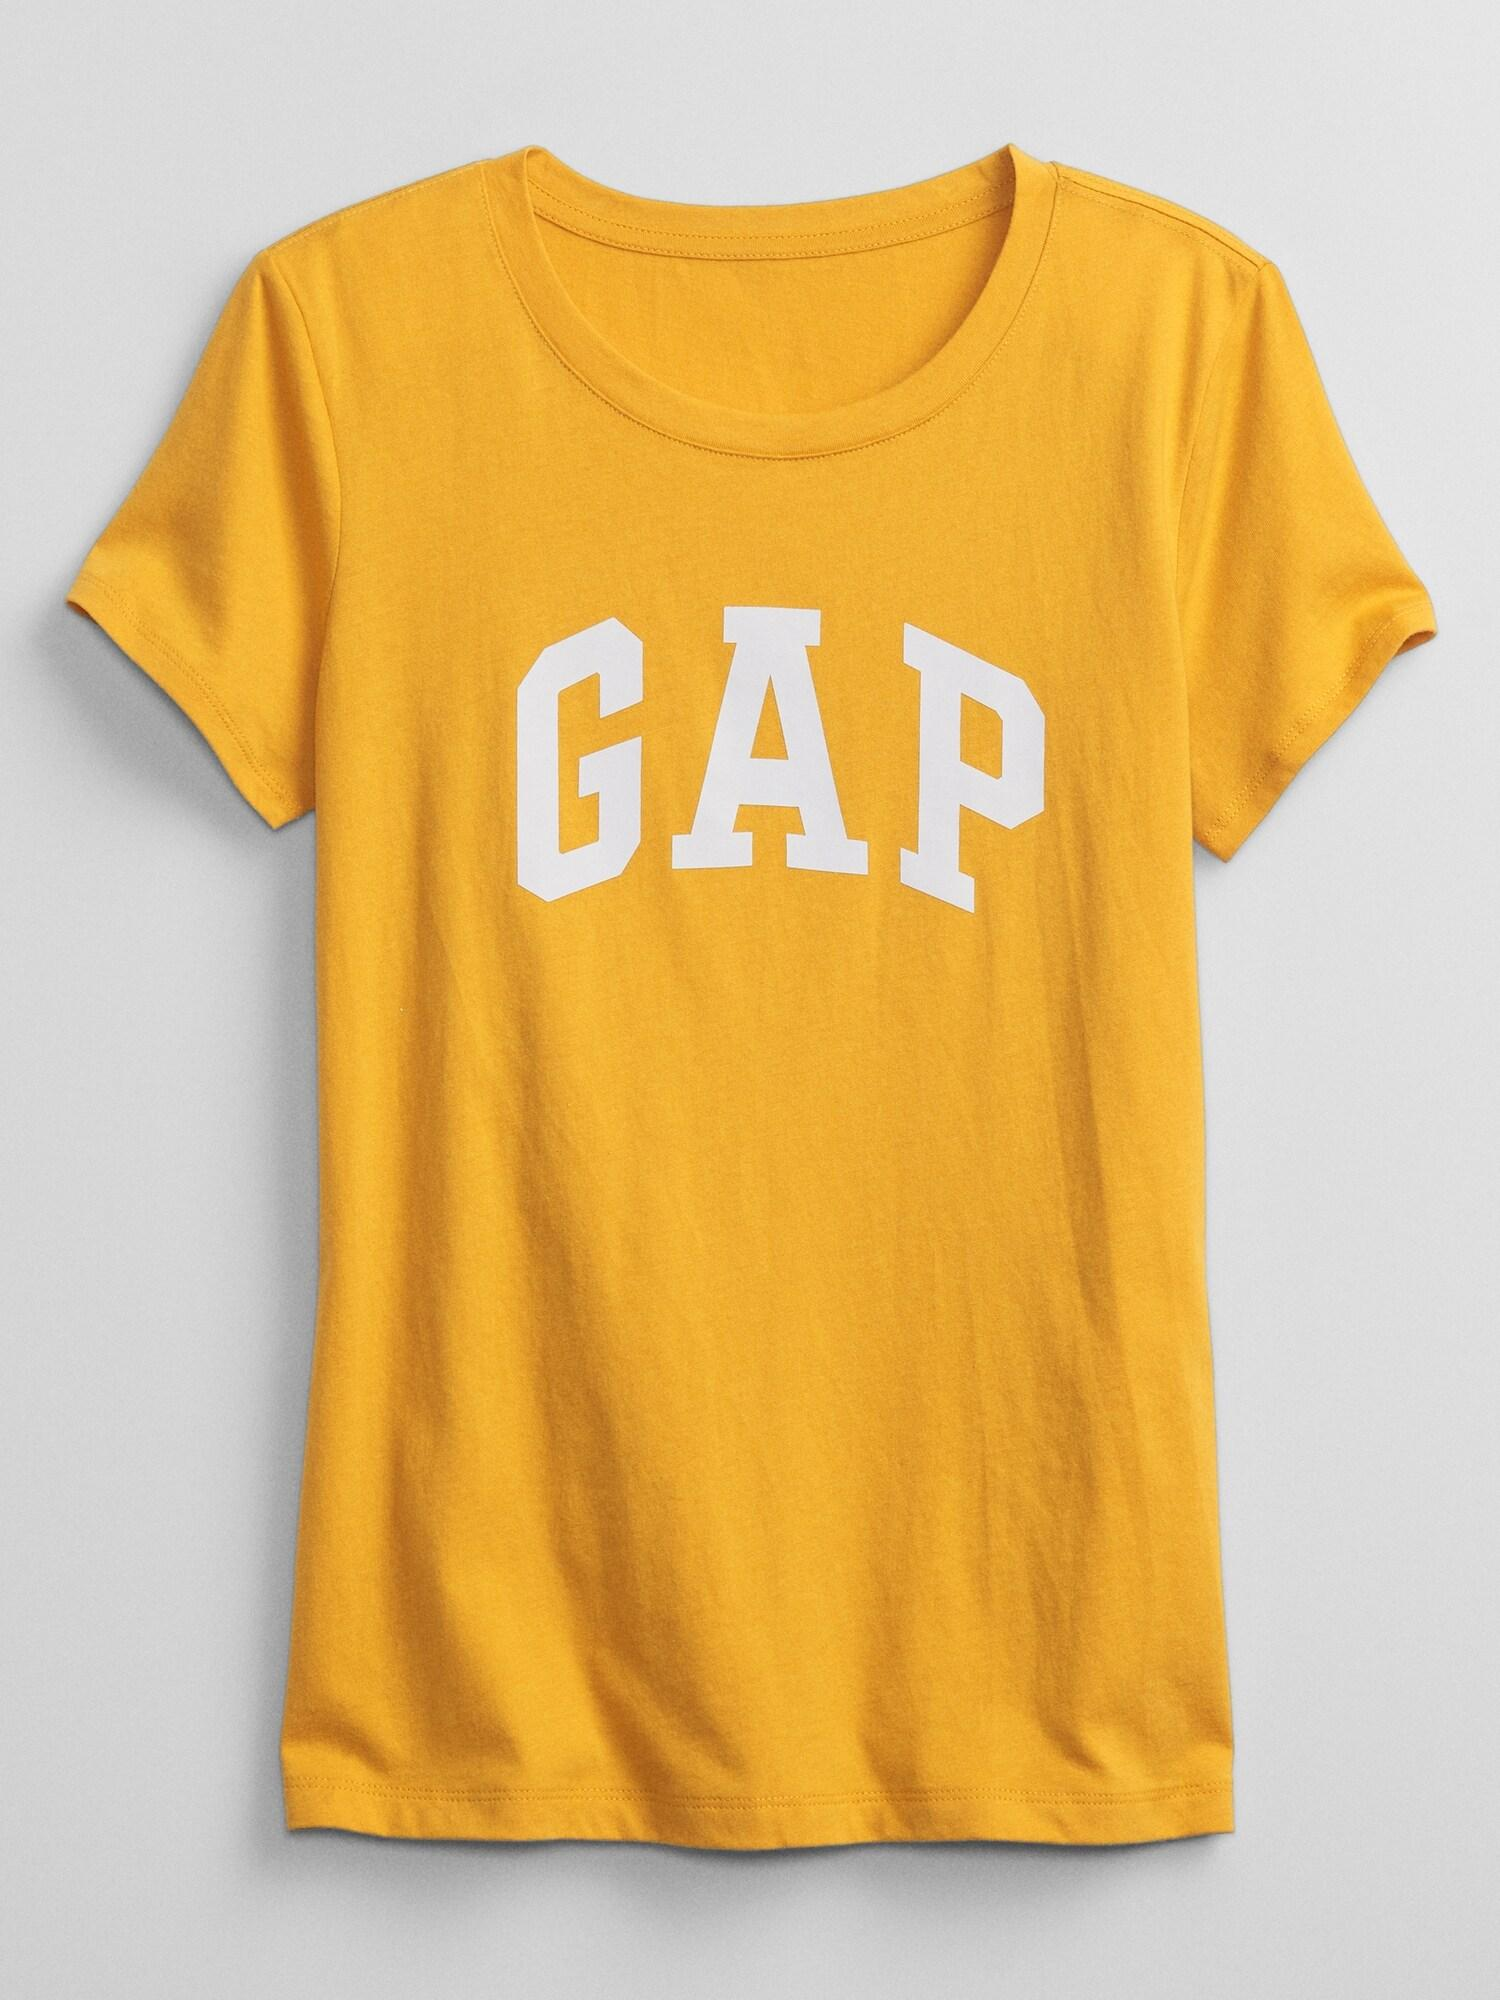 GAP Koszulki, topy damskie żółty